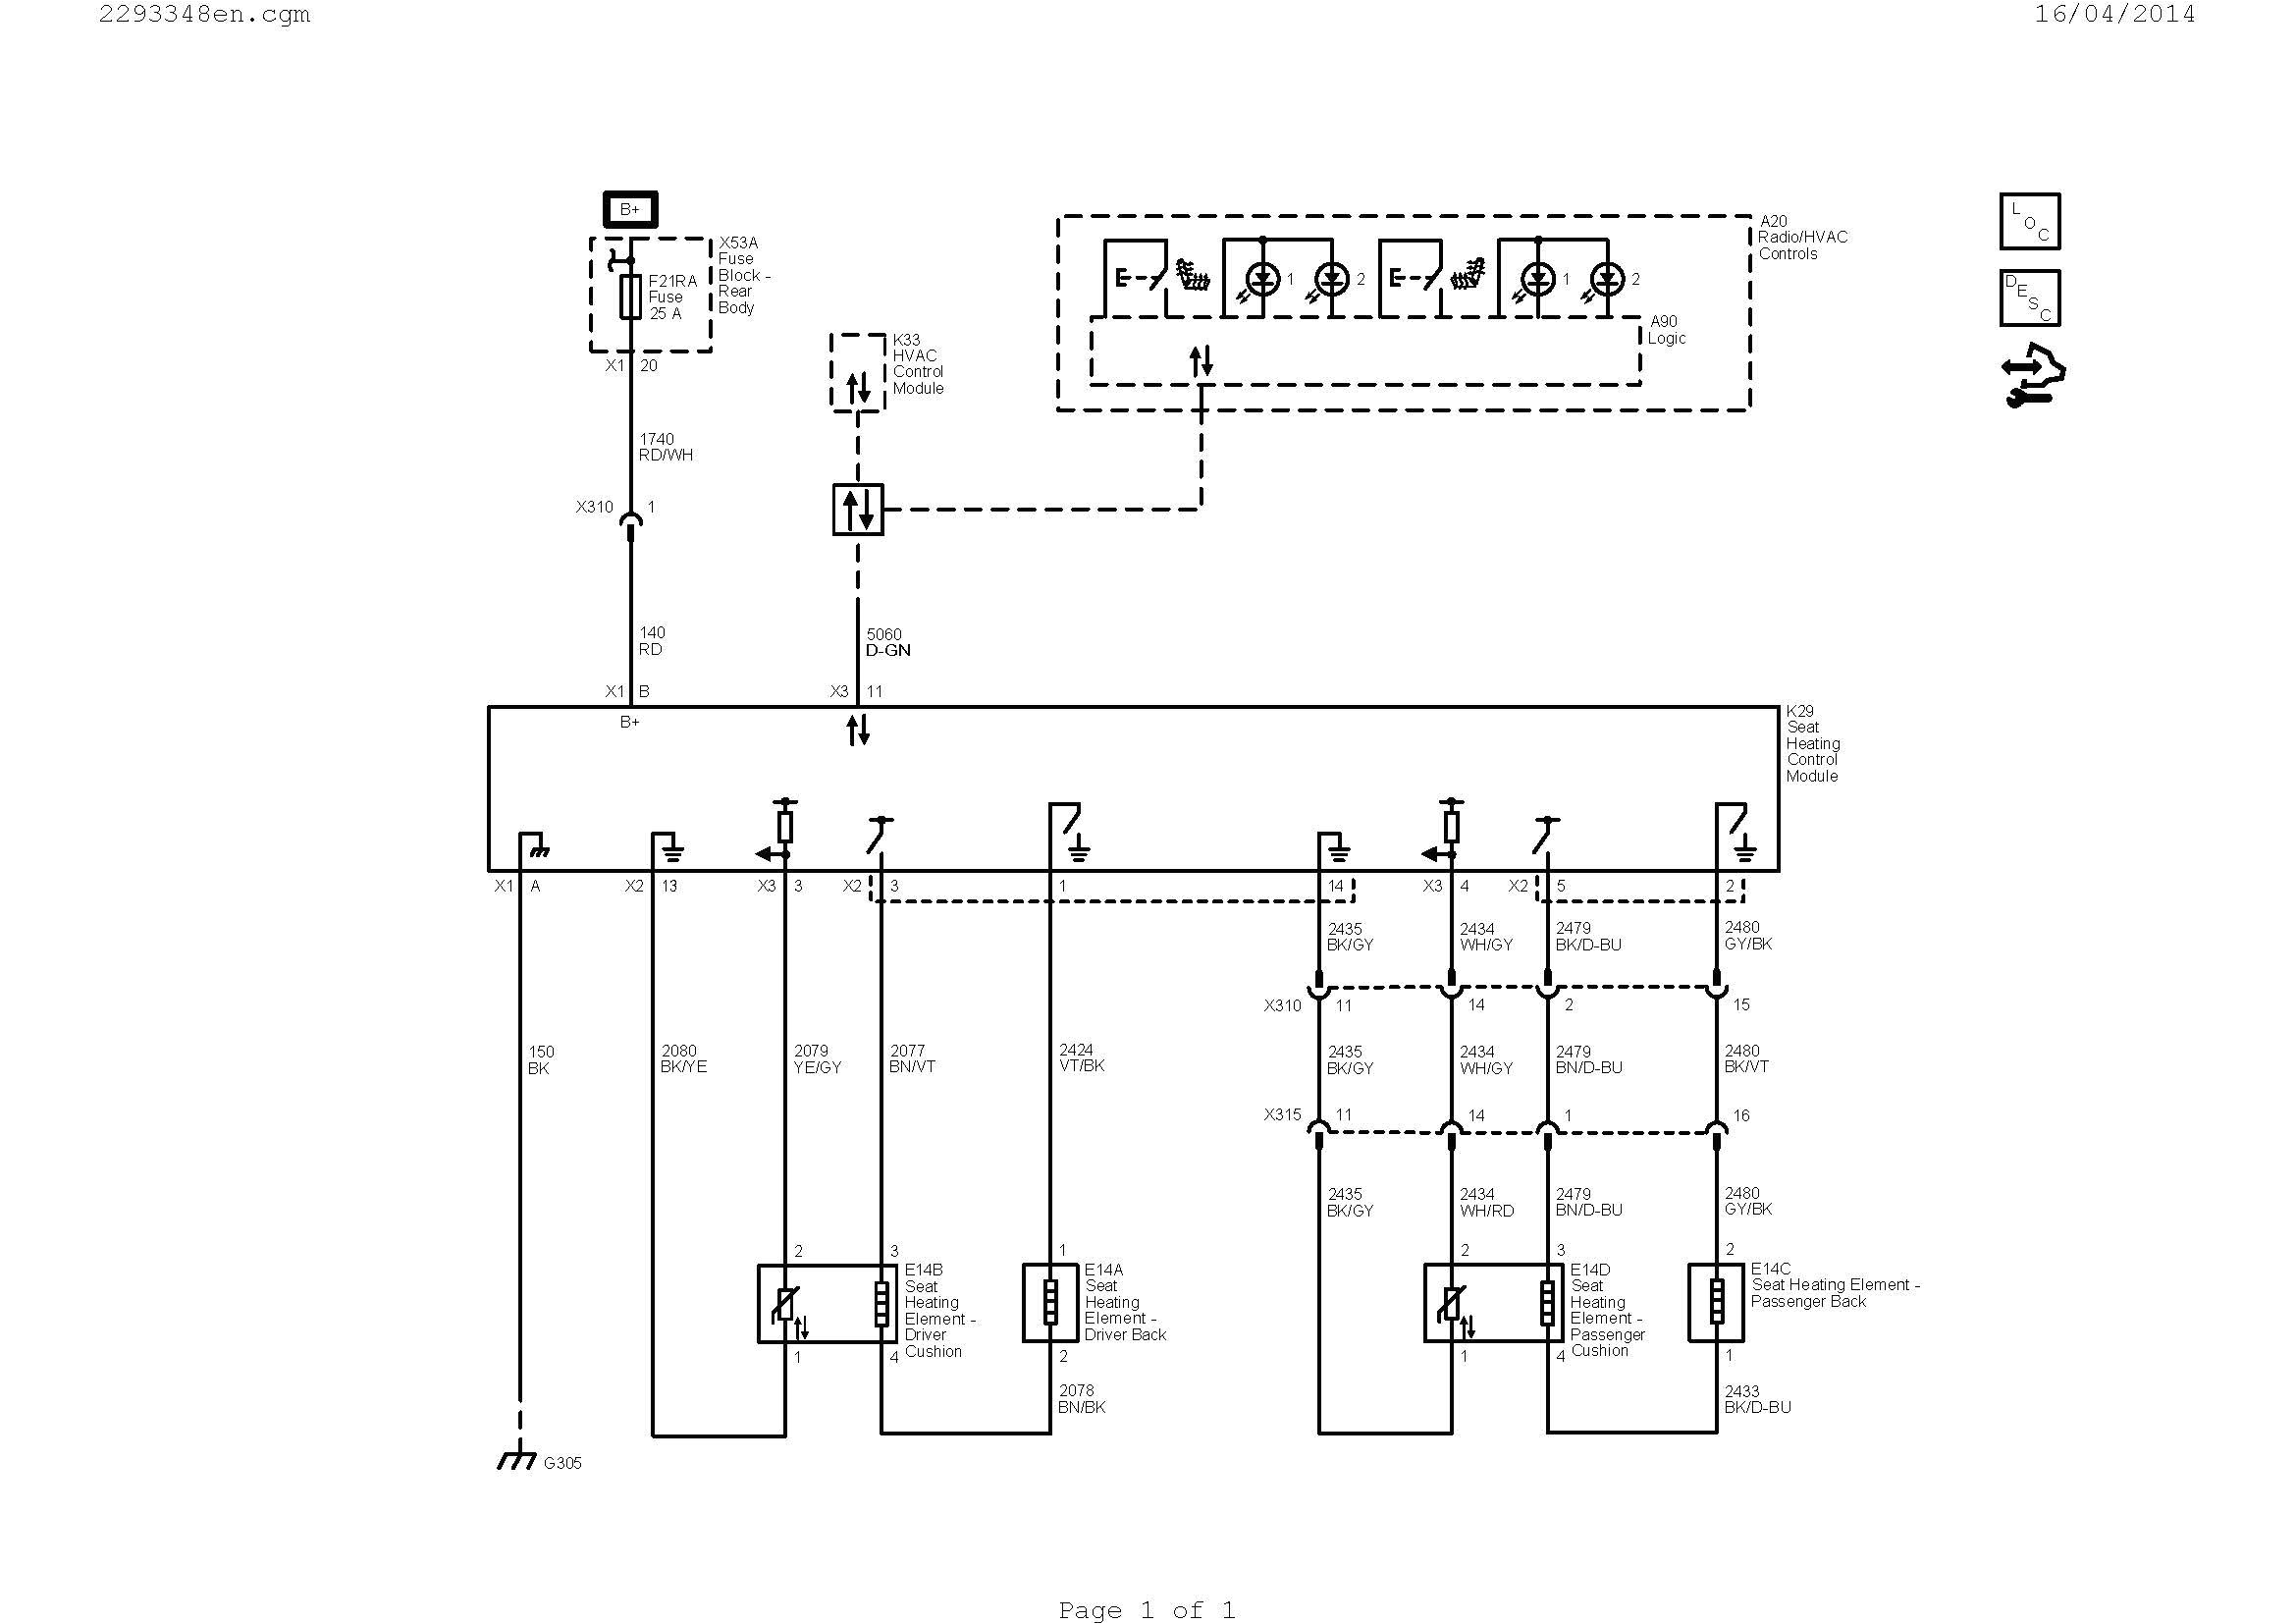 goodman wiring diagram wiring diagram for changeover relay inspirationa wiring diagram ac of goodman wiring diagram jpg